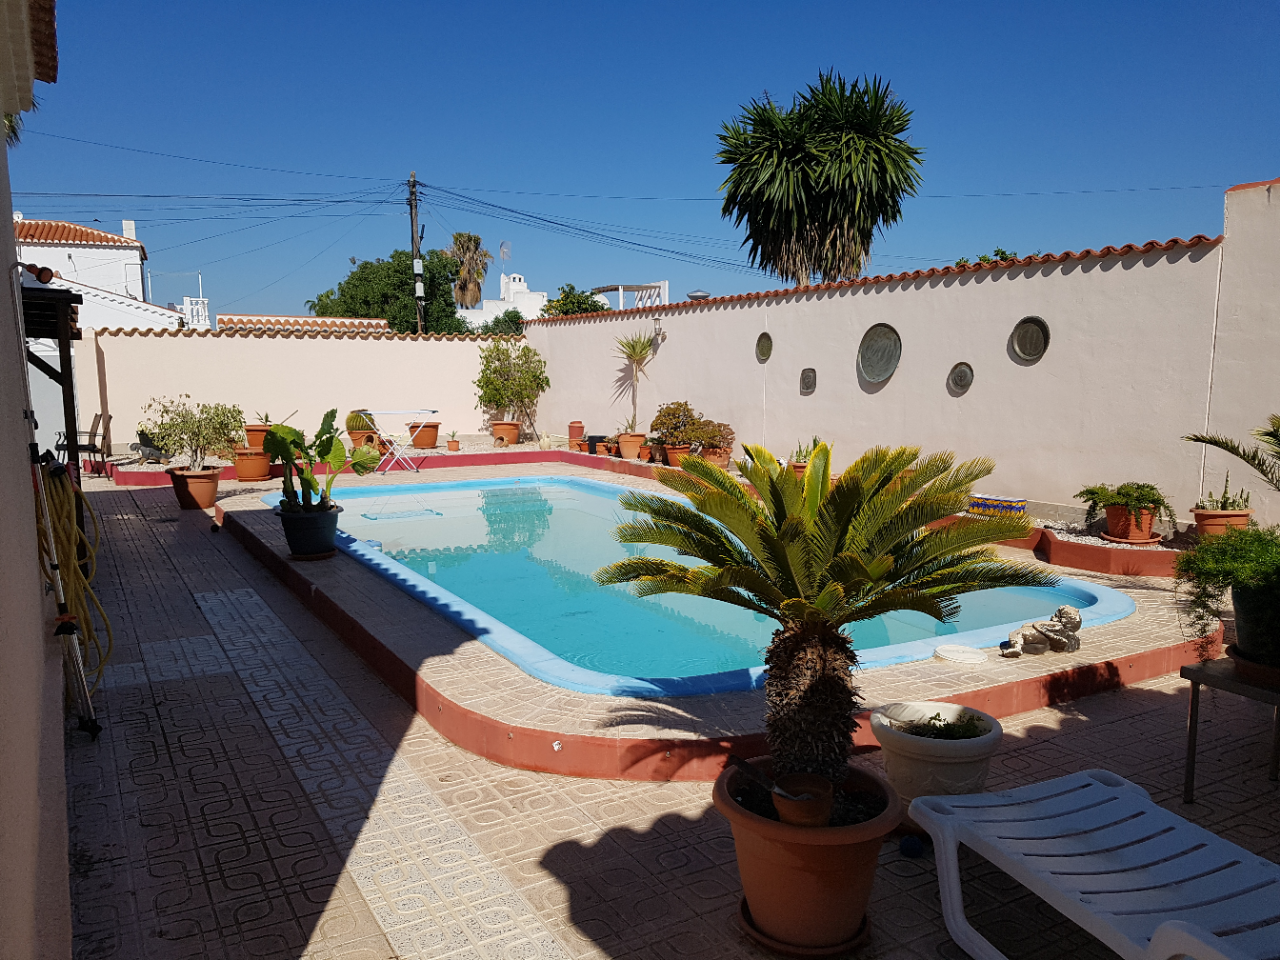 SPAIN COSTA BLANCA Torrevieja Torretta Florida, Semi-detached Villa with private pool on 401 sqm plot